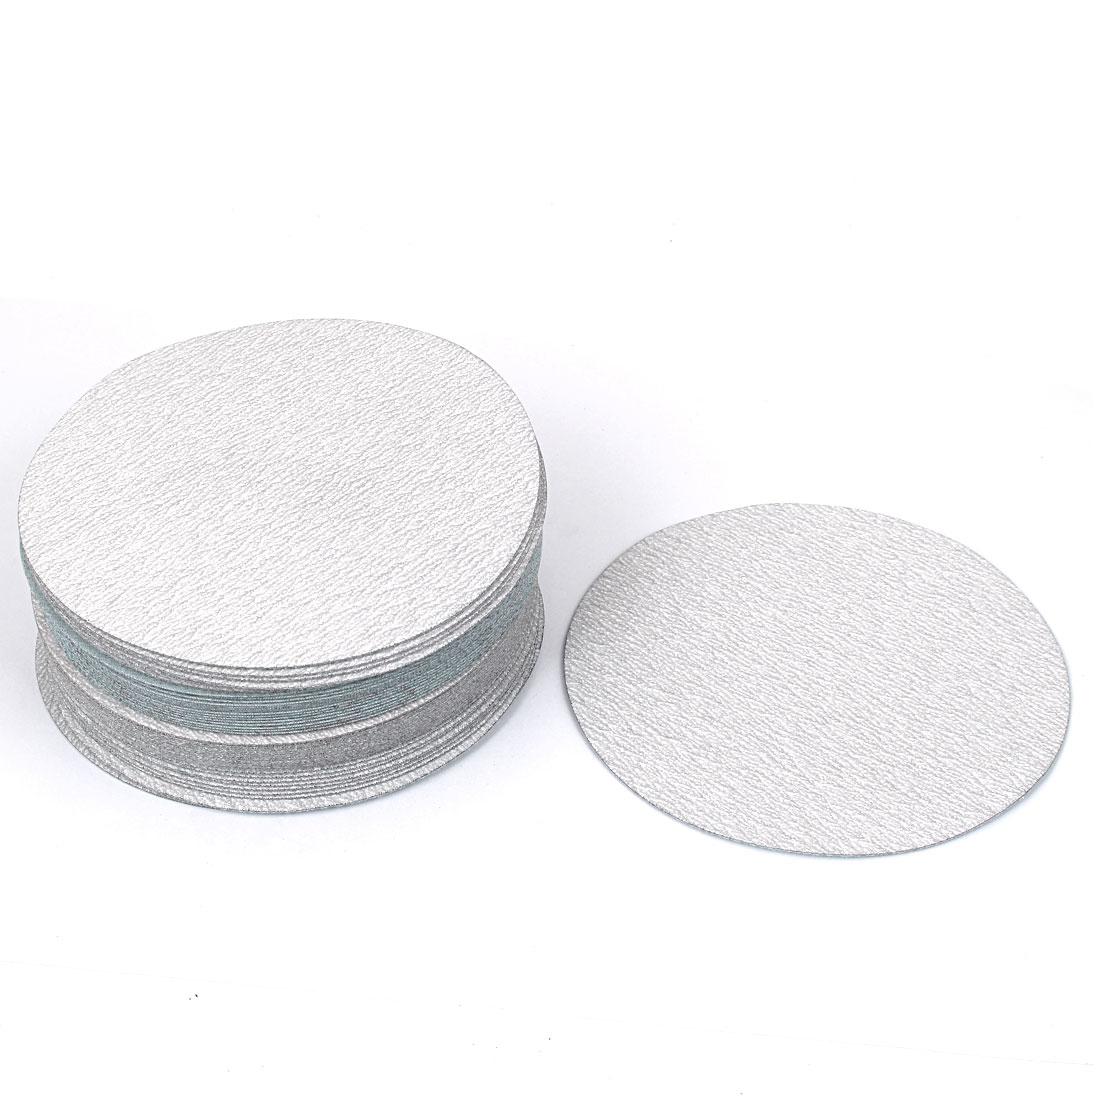 6inch Dia Round Dry Abrasive Sanding Flocking Sandpaper Disc 320 Grit 50pcs